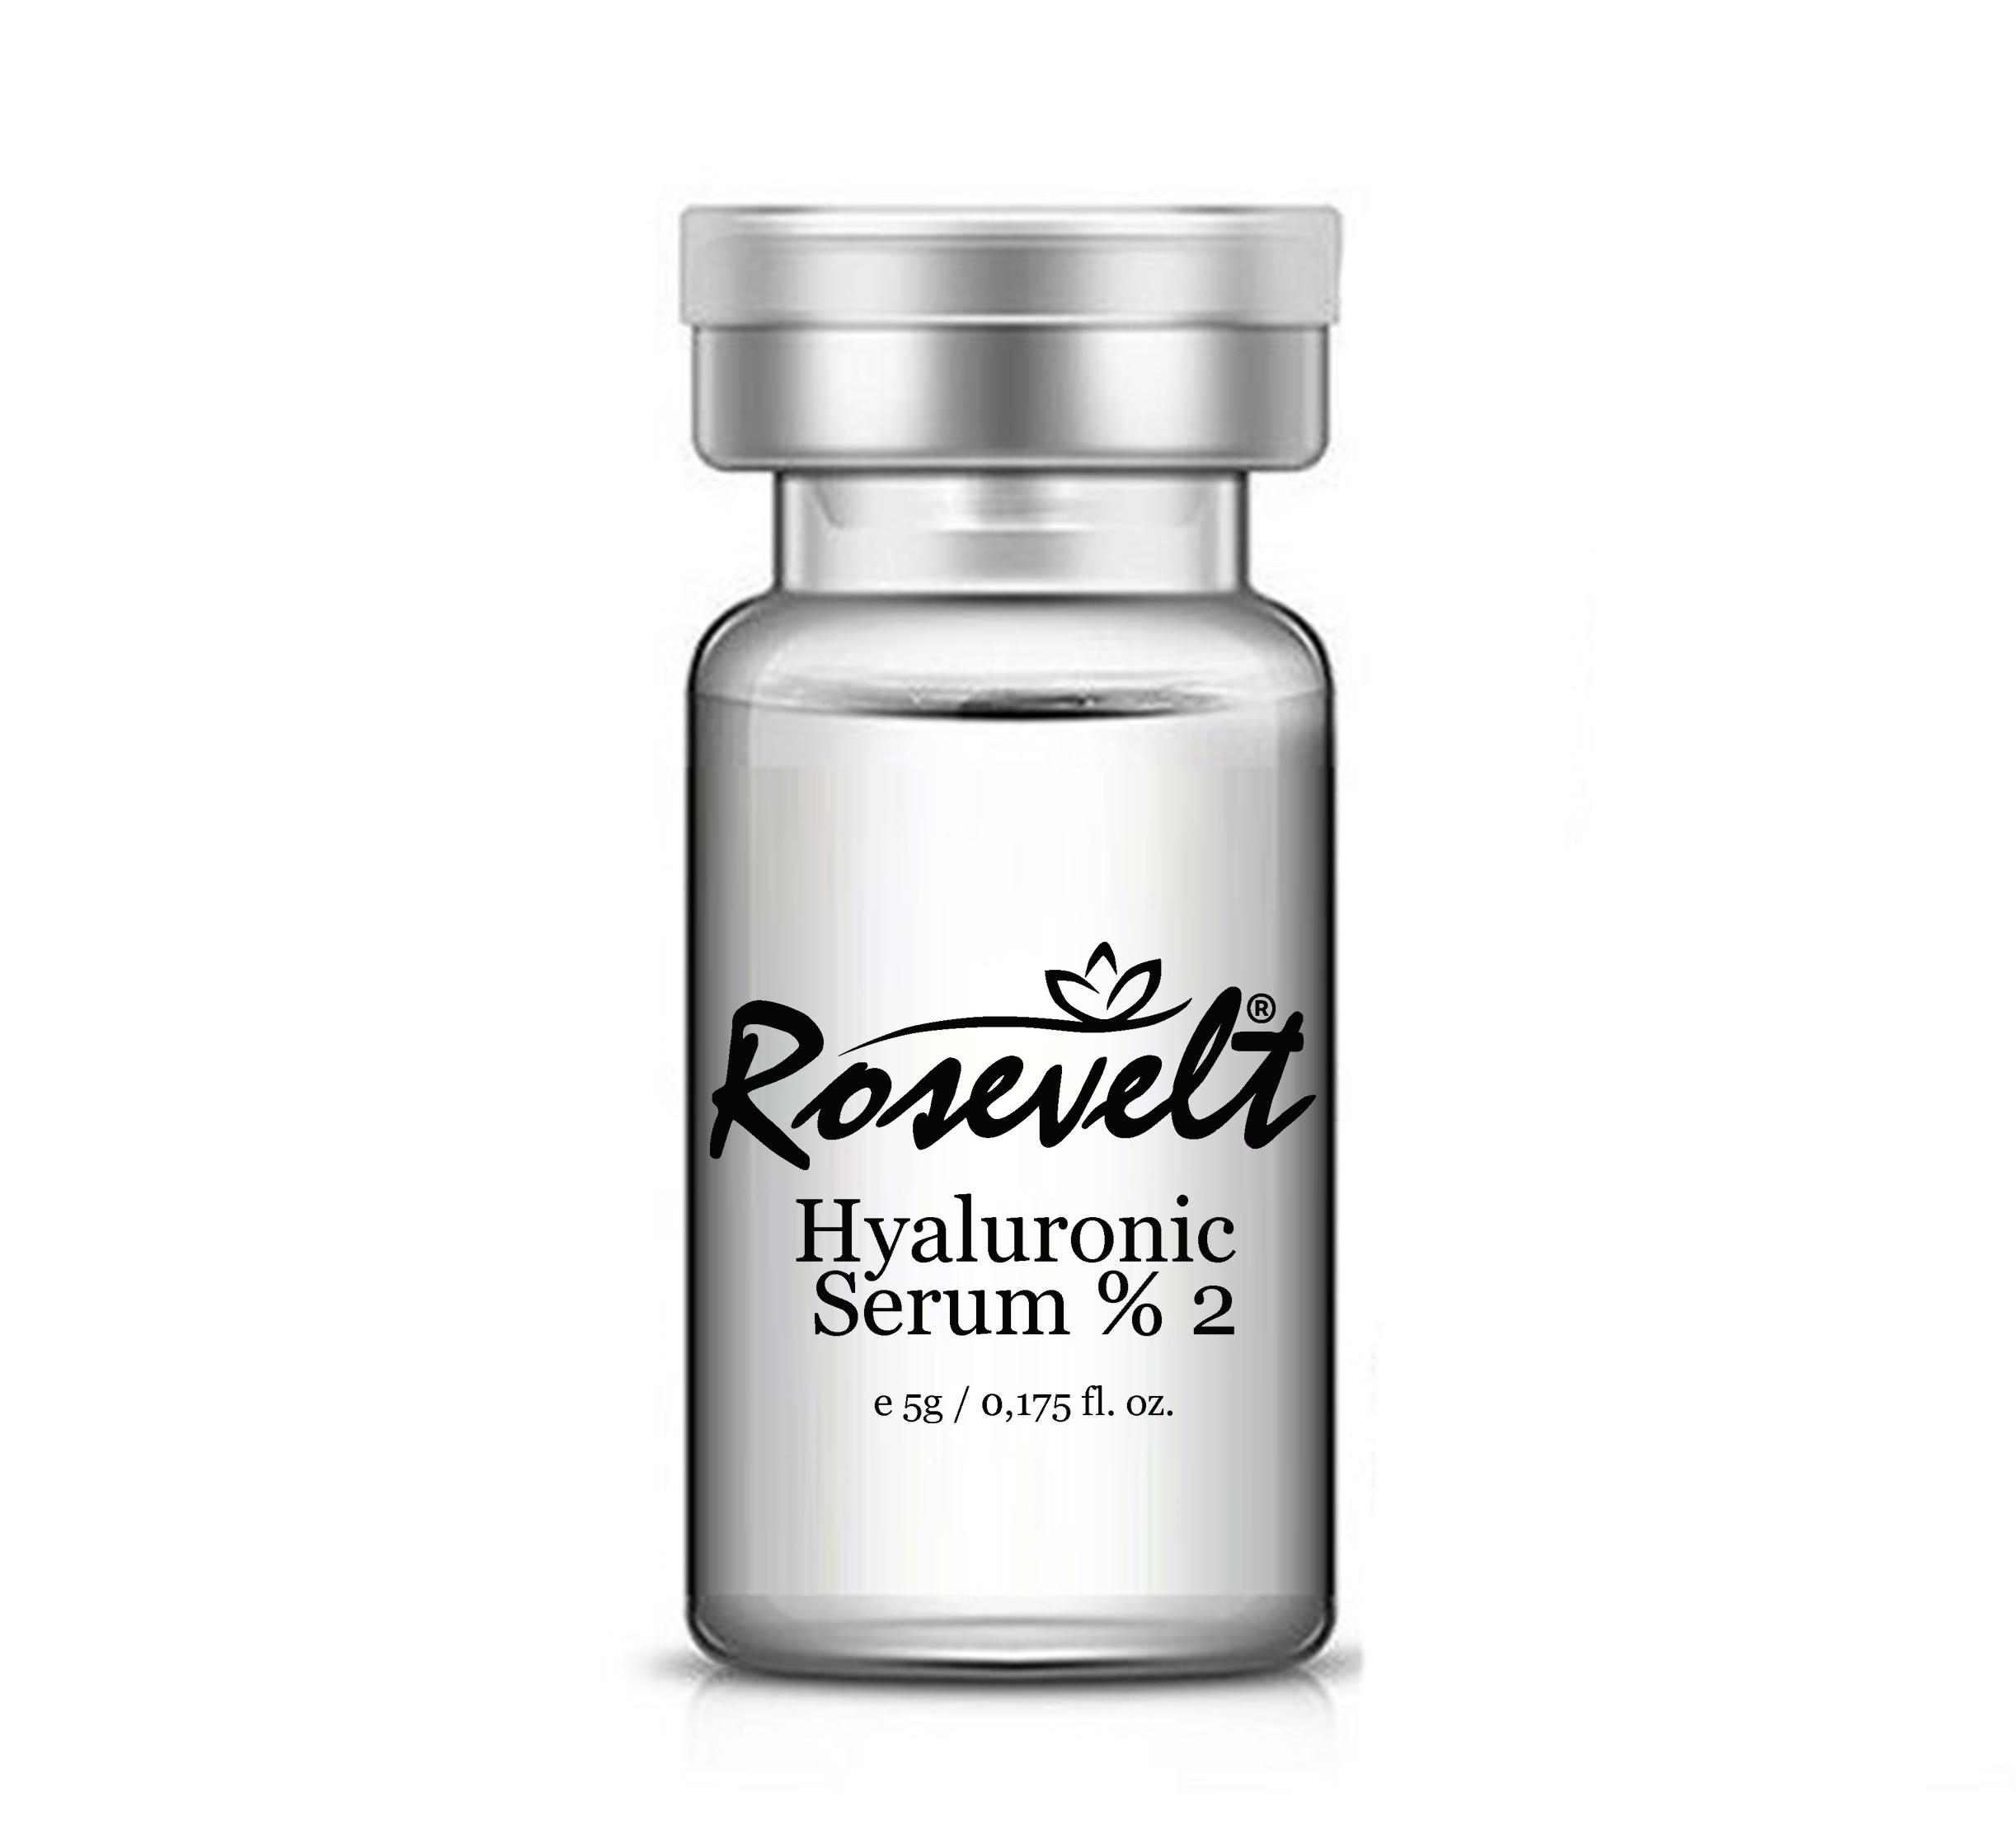 hyaluronicasit2 - ROSEVELT HYALURONİK ASİT %2 KUTU